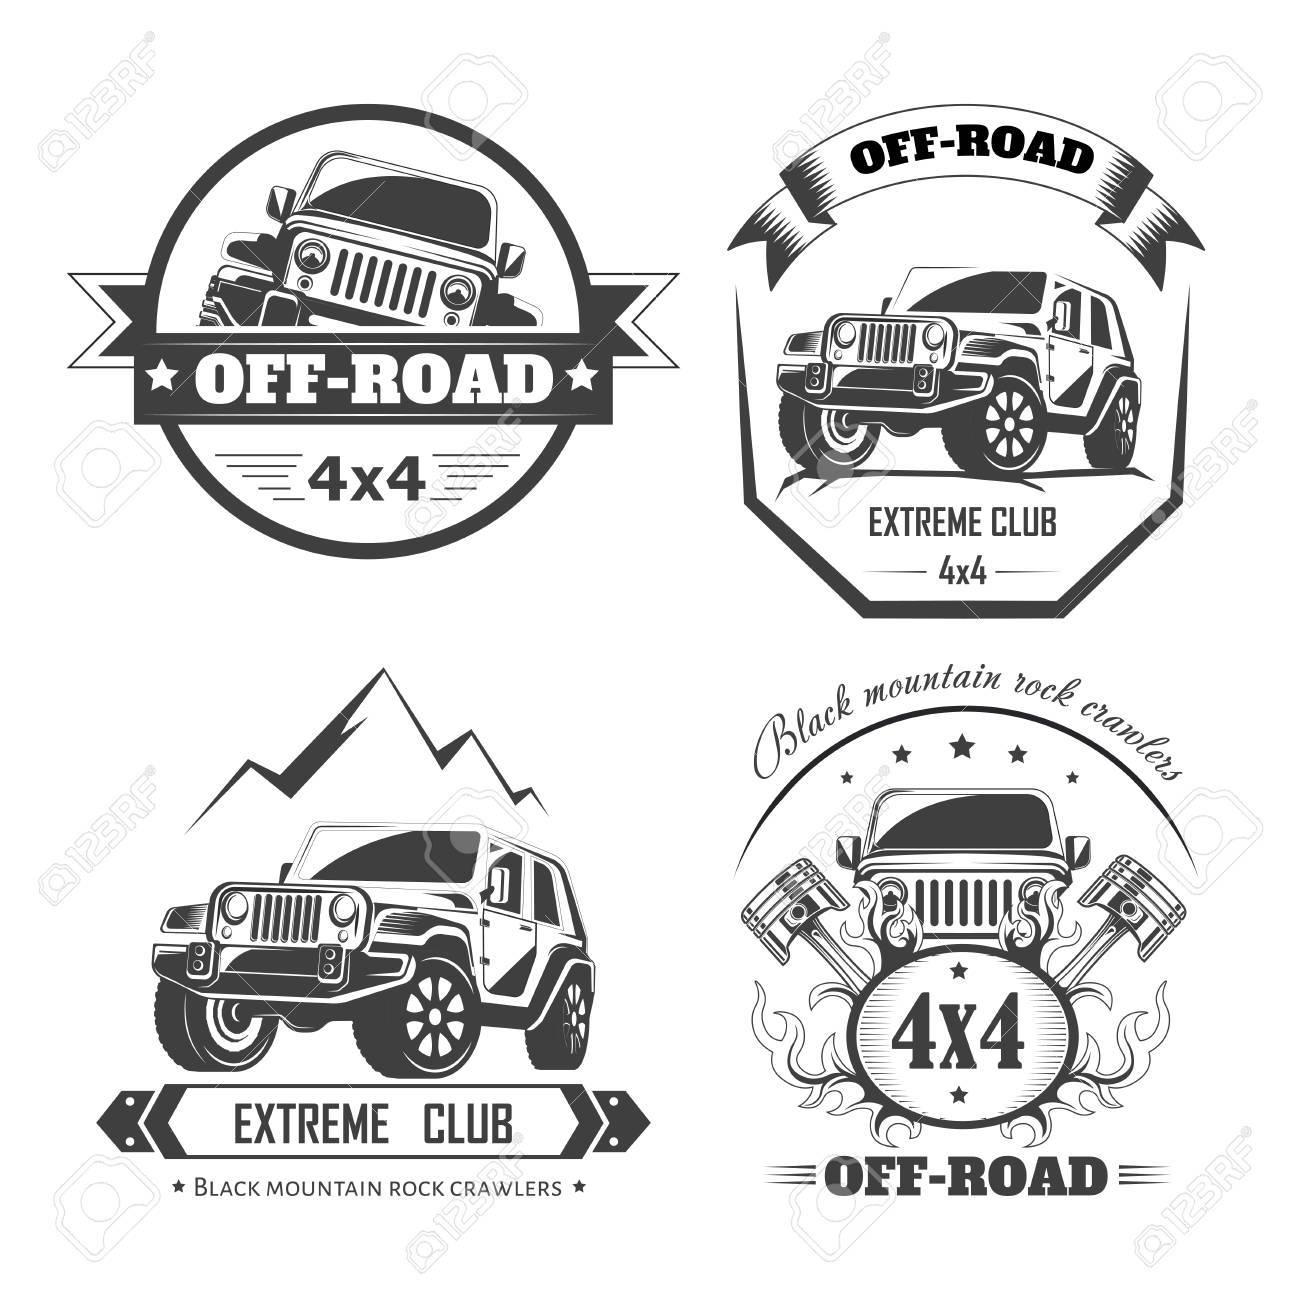 Off Road 4x4 Extreme Car Club Logo Templates Vector Symbols Royalty Free Cliparts Vectors And Stock Illustration Image 88350861